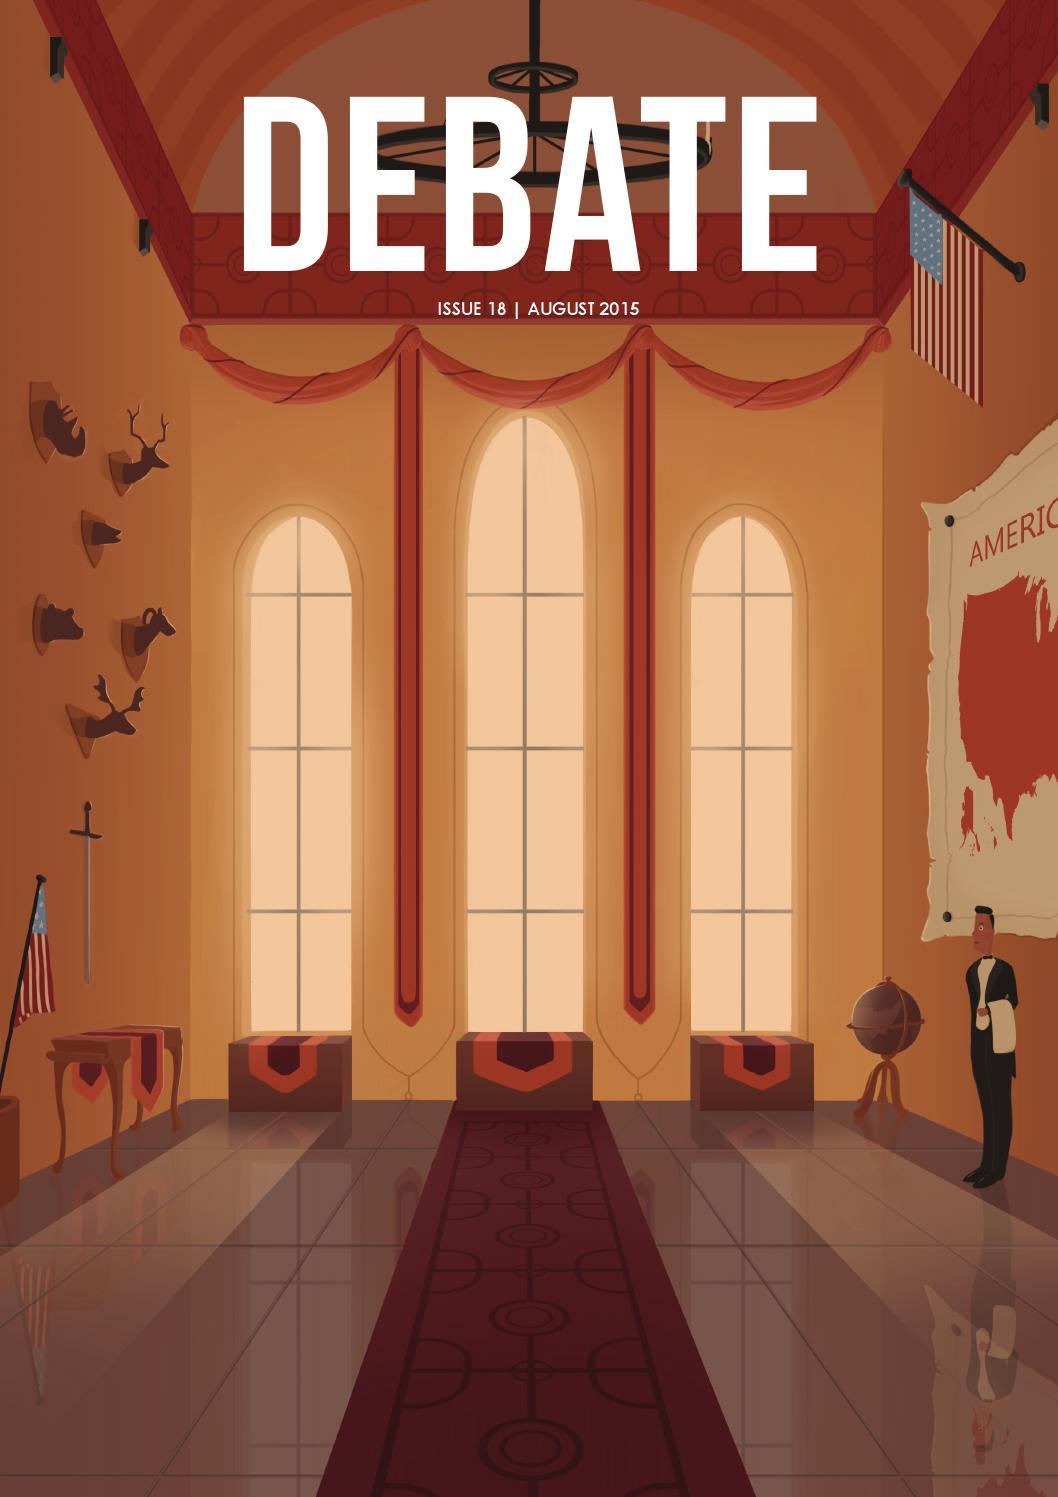 Debate Issue 18 2015 By Magazine Issuu Durex Play Longer For Edi